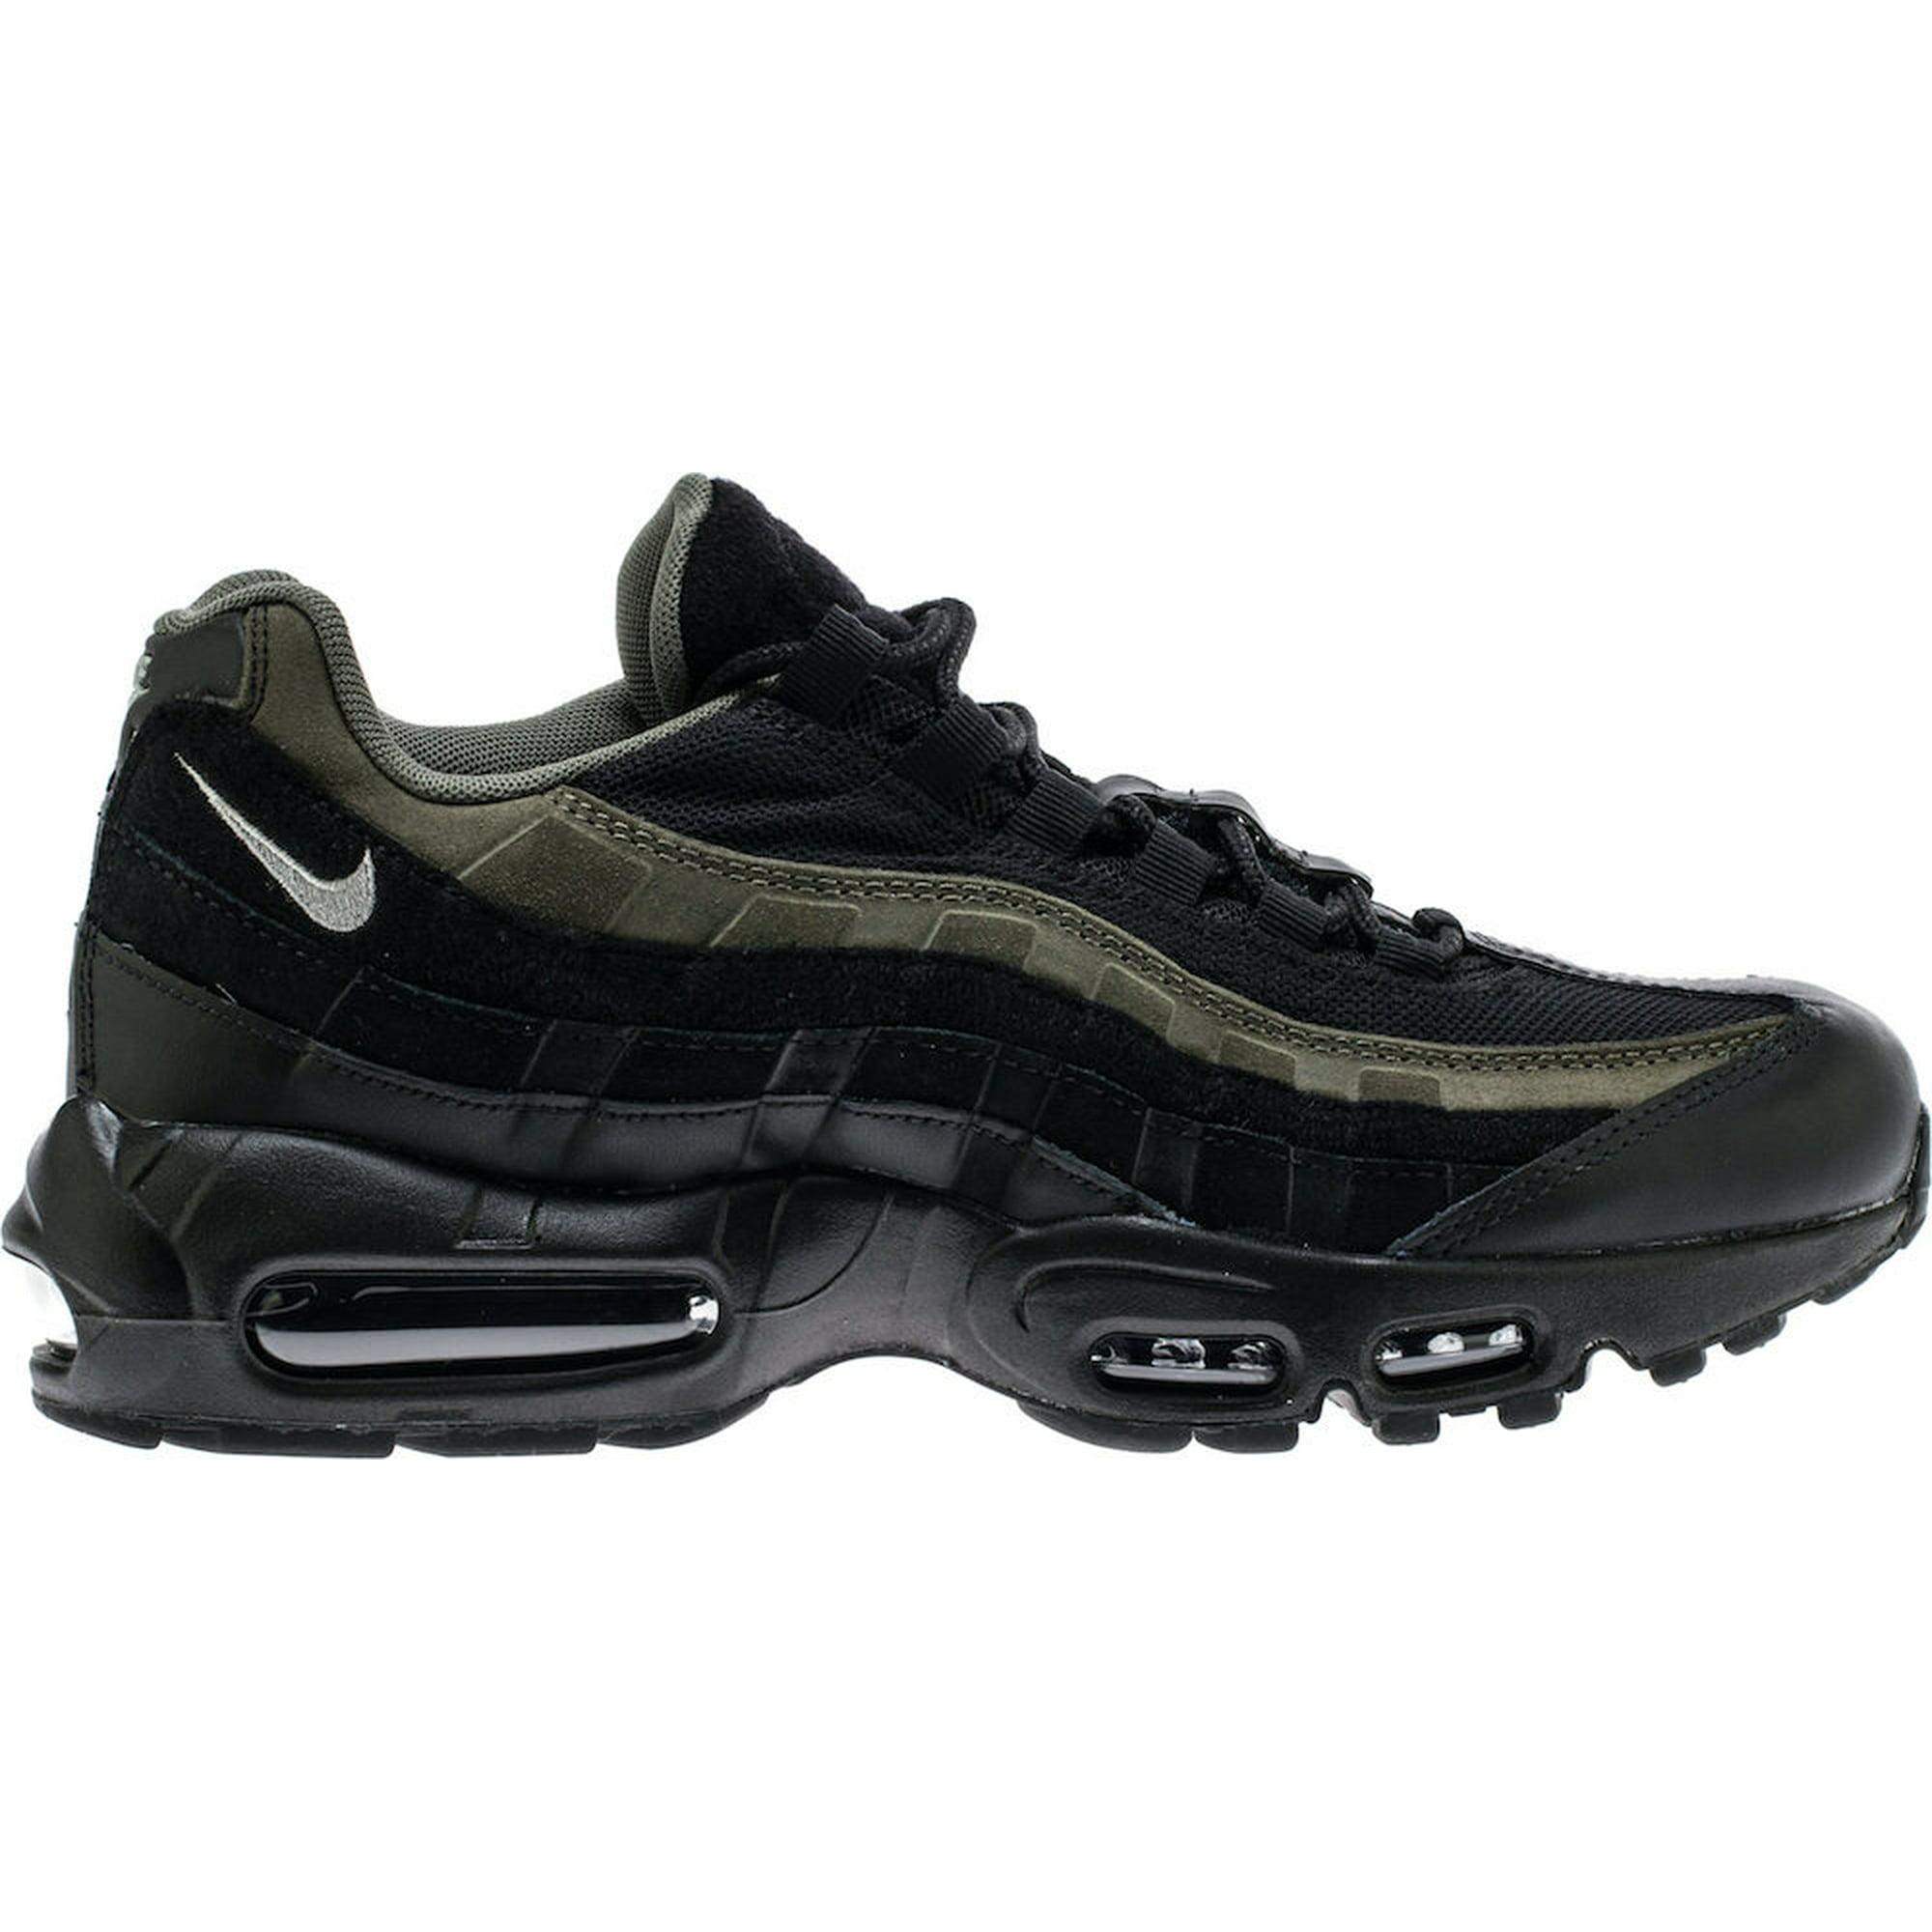 a04b060e71 Buy Nike Men's Air Max 95 Hal Fashion Sneakers (9.5) | Cheapest NIKE ...